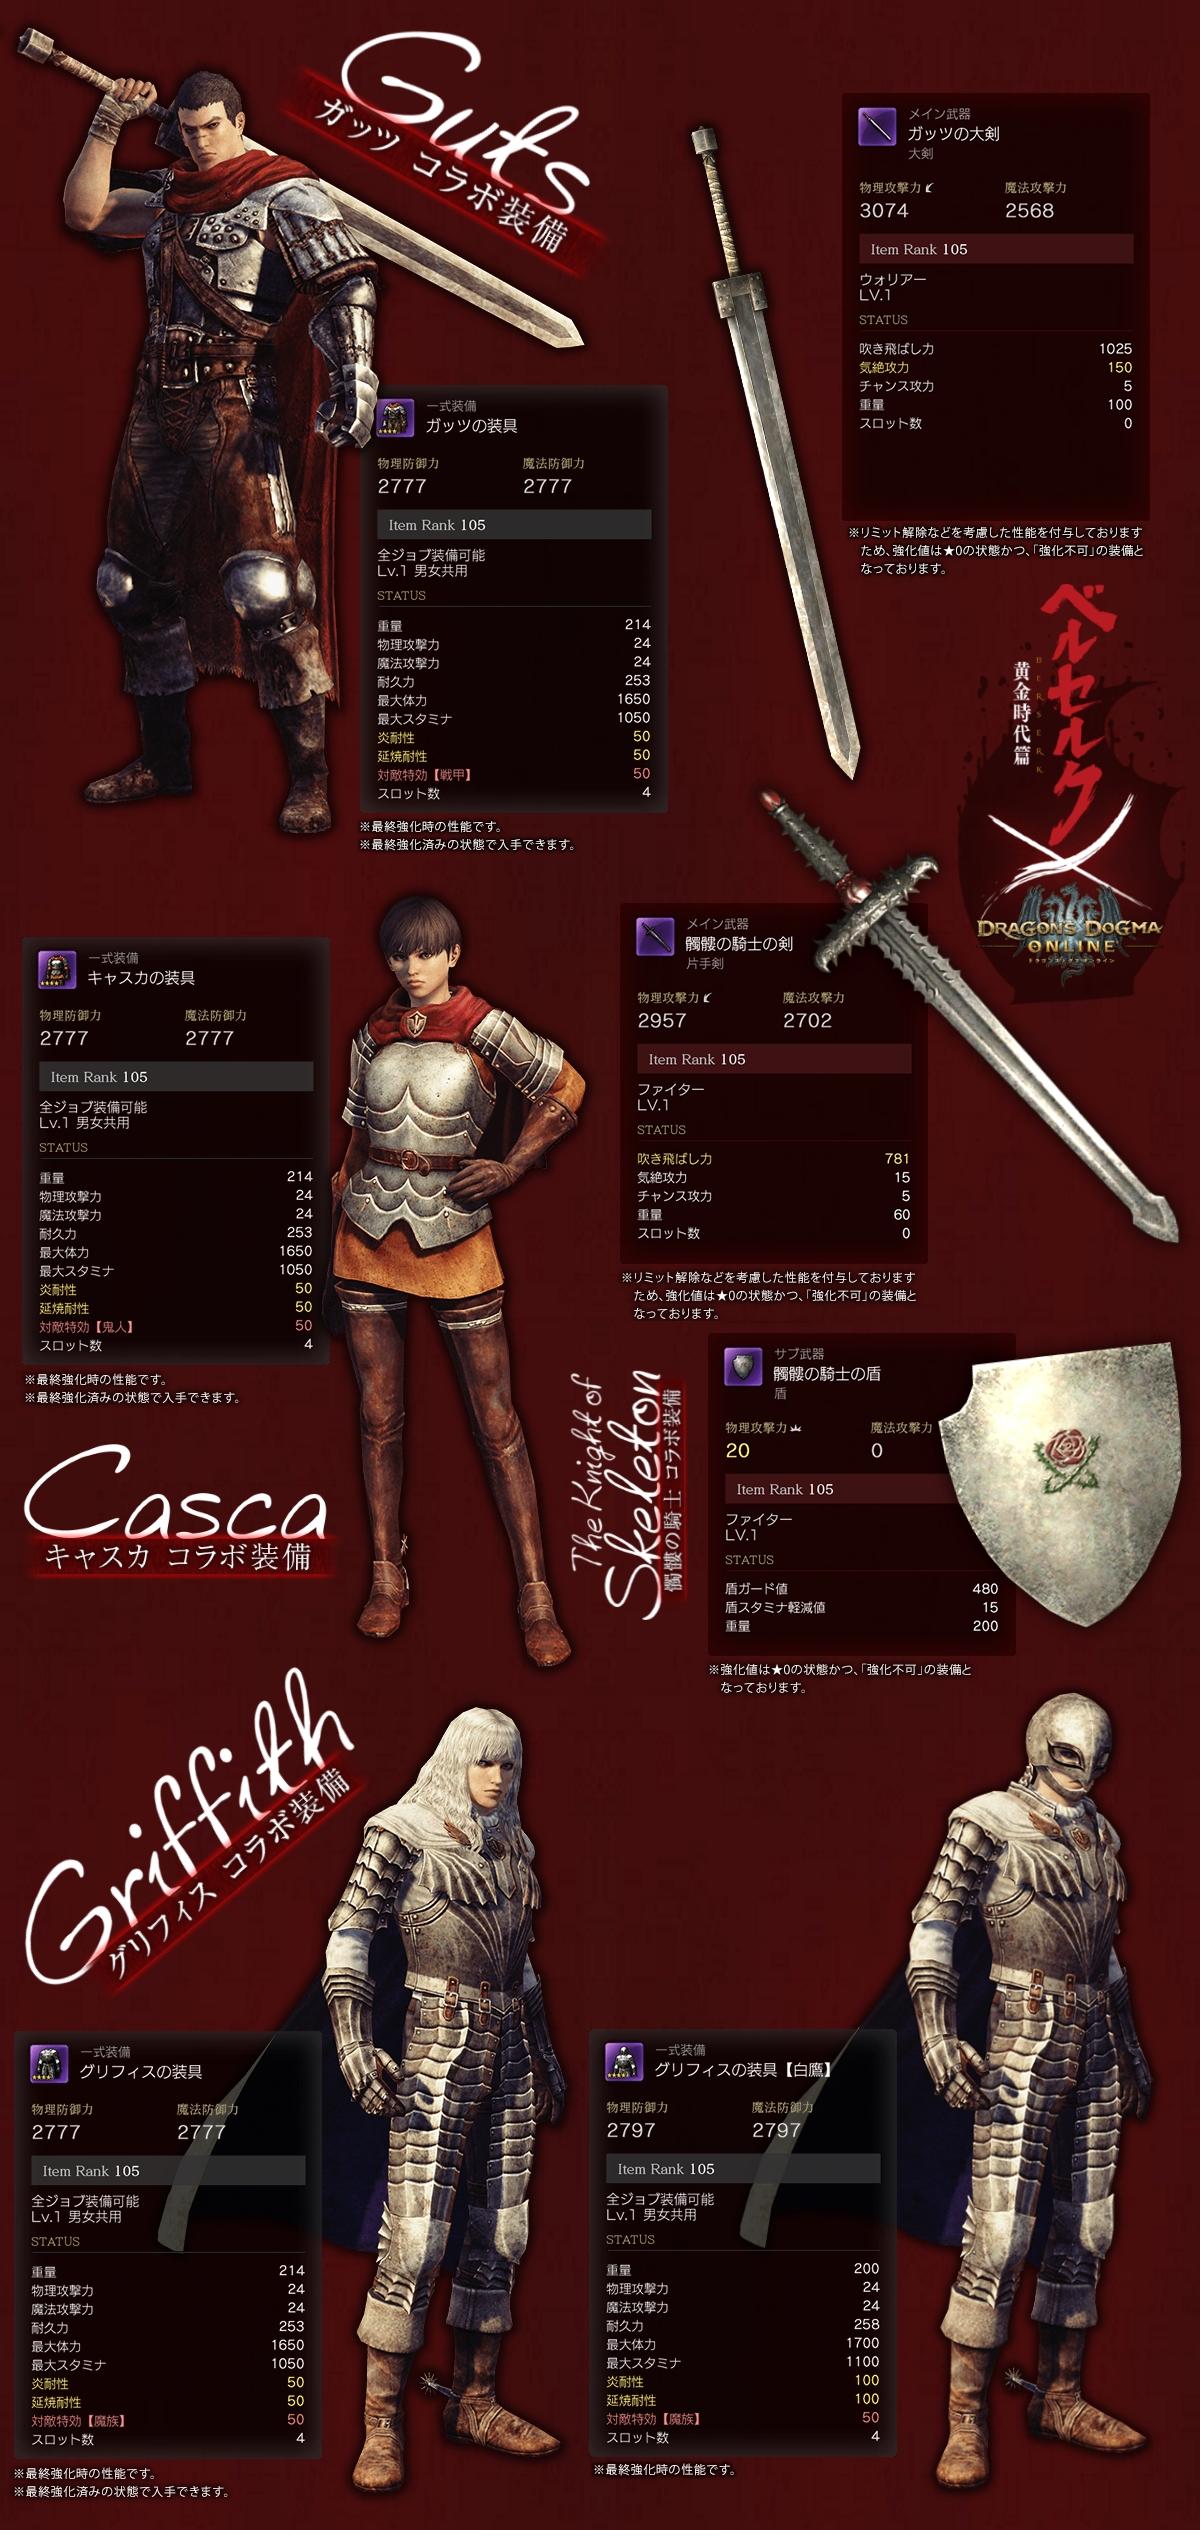 Dragons Dogma Online x BERSERK items